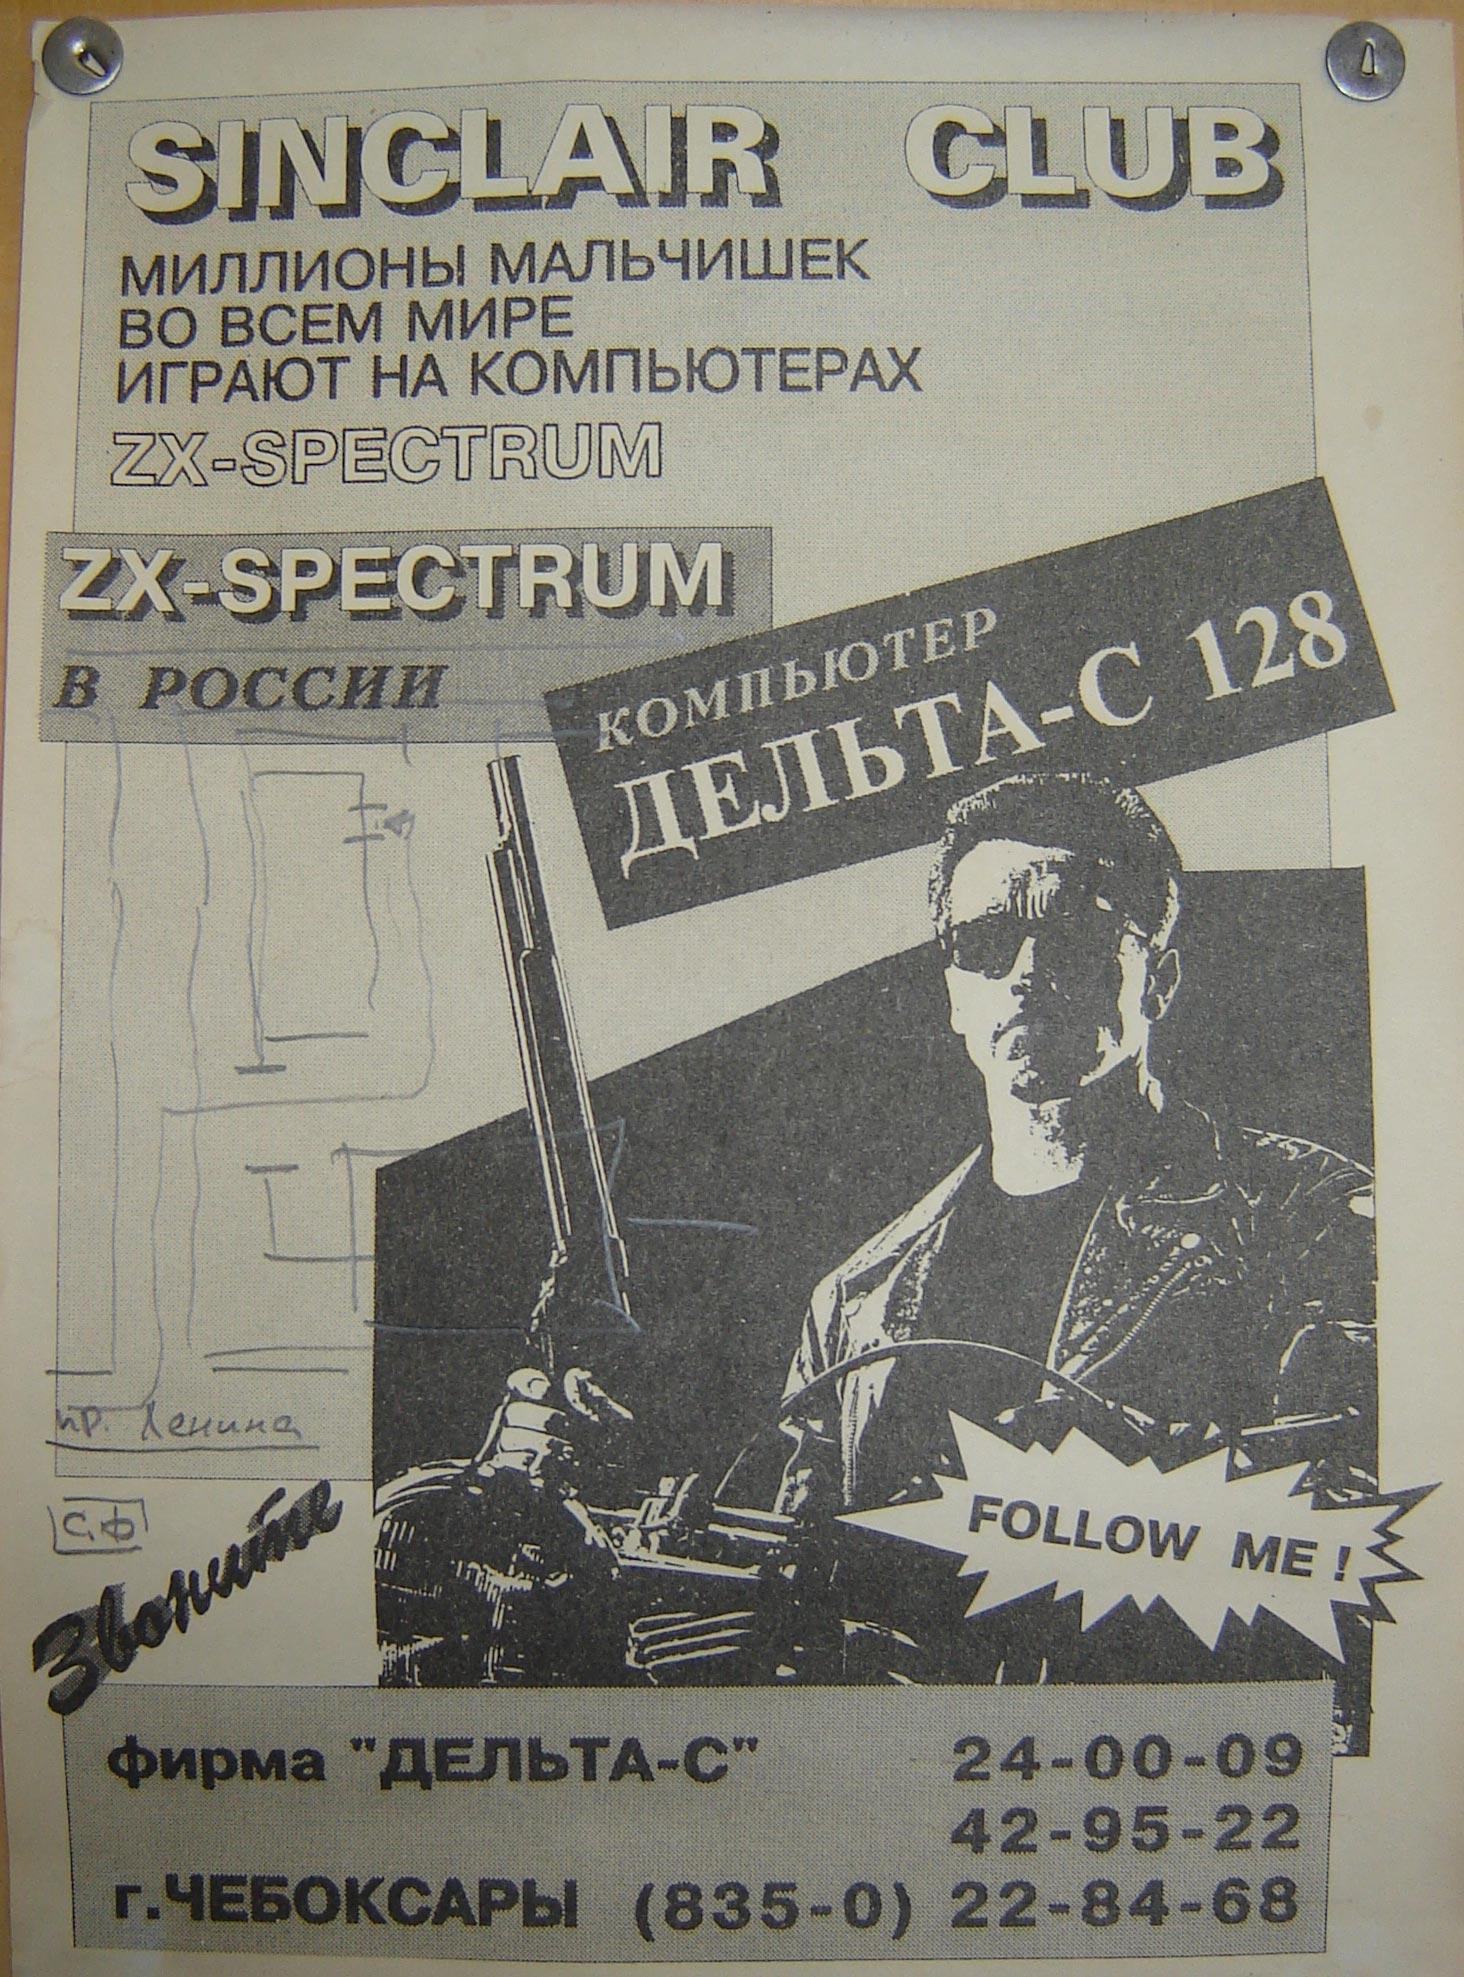 http://zxdemos.ru/img/posts/posts_21/35403_26.jpg